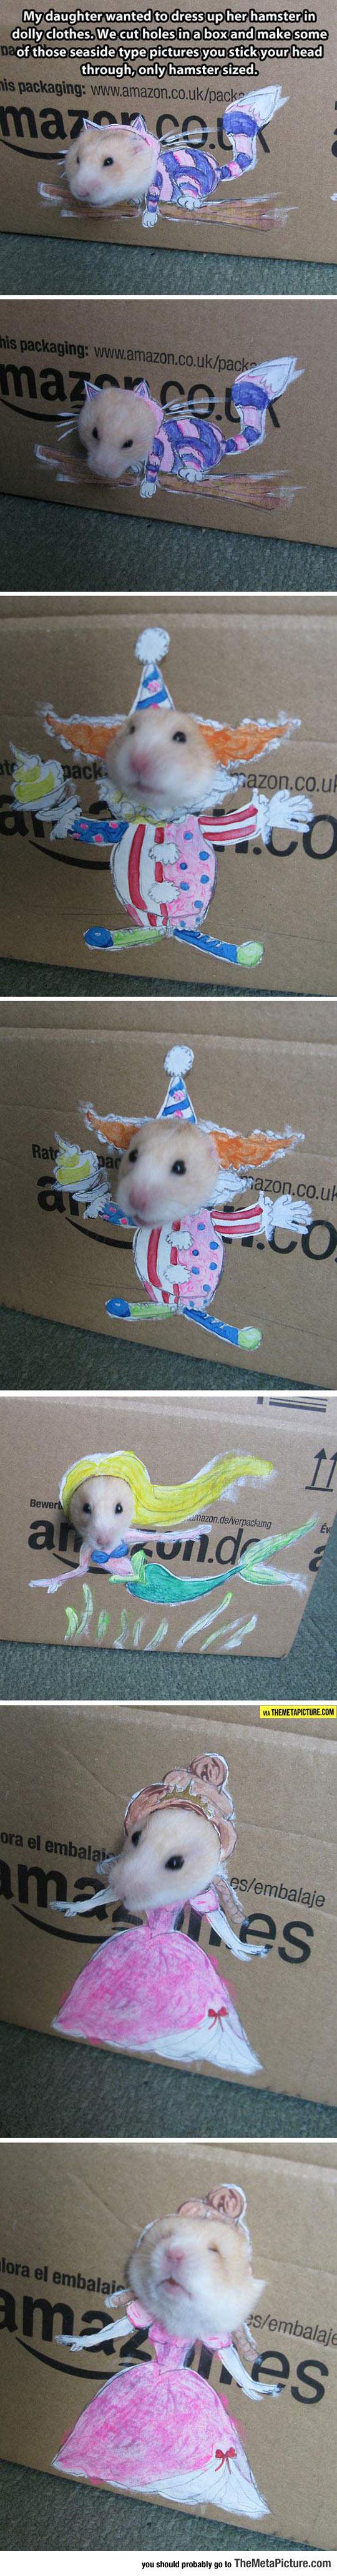 cool-hamster-dressed-princess